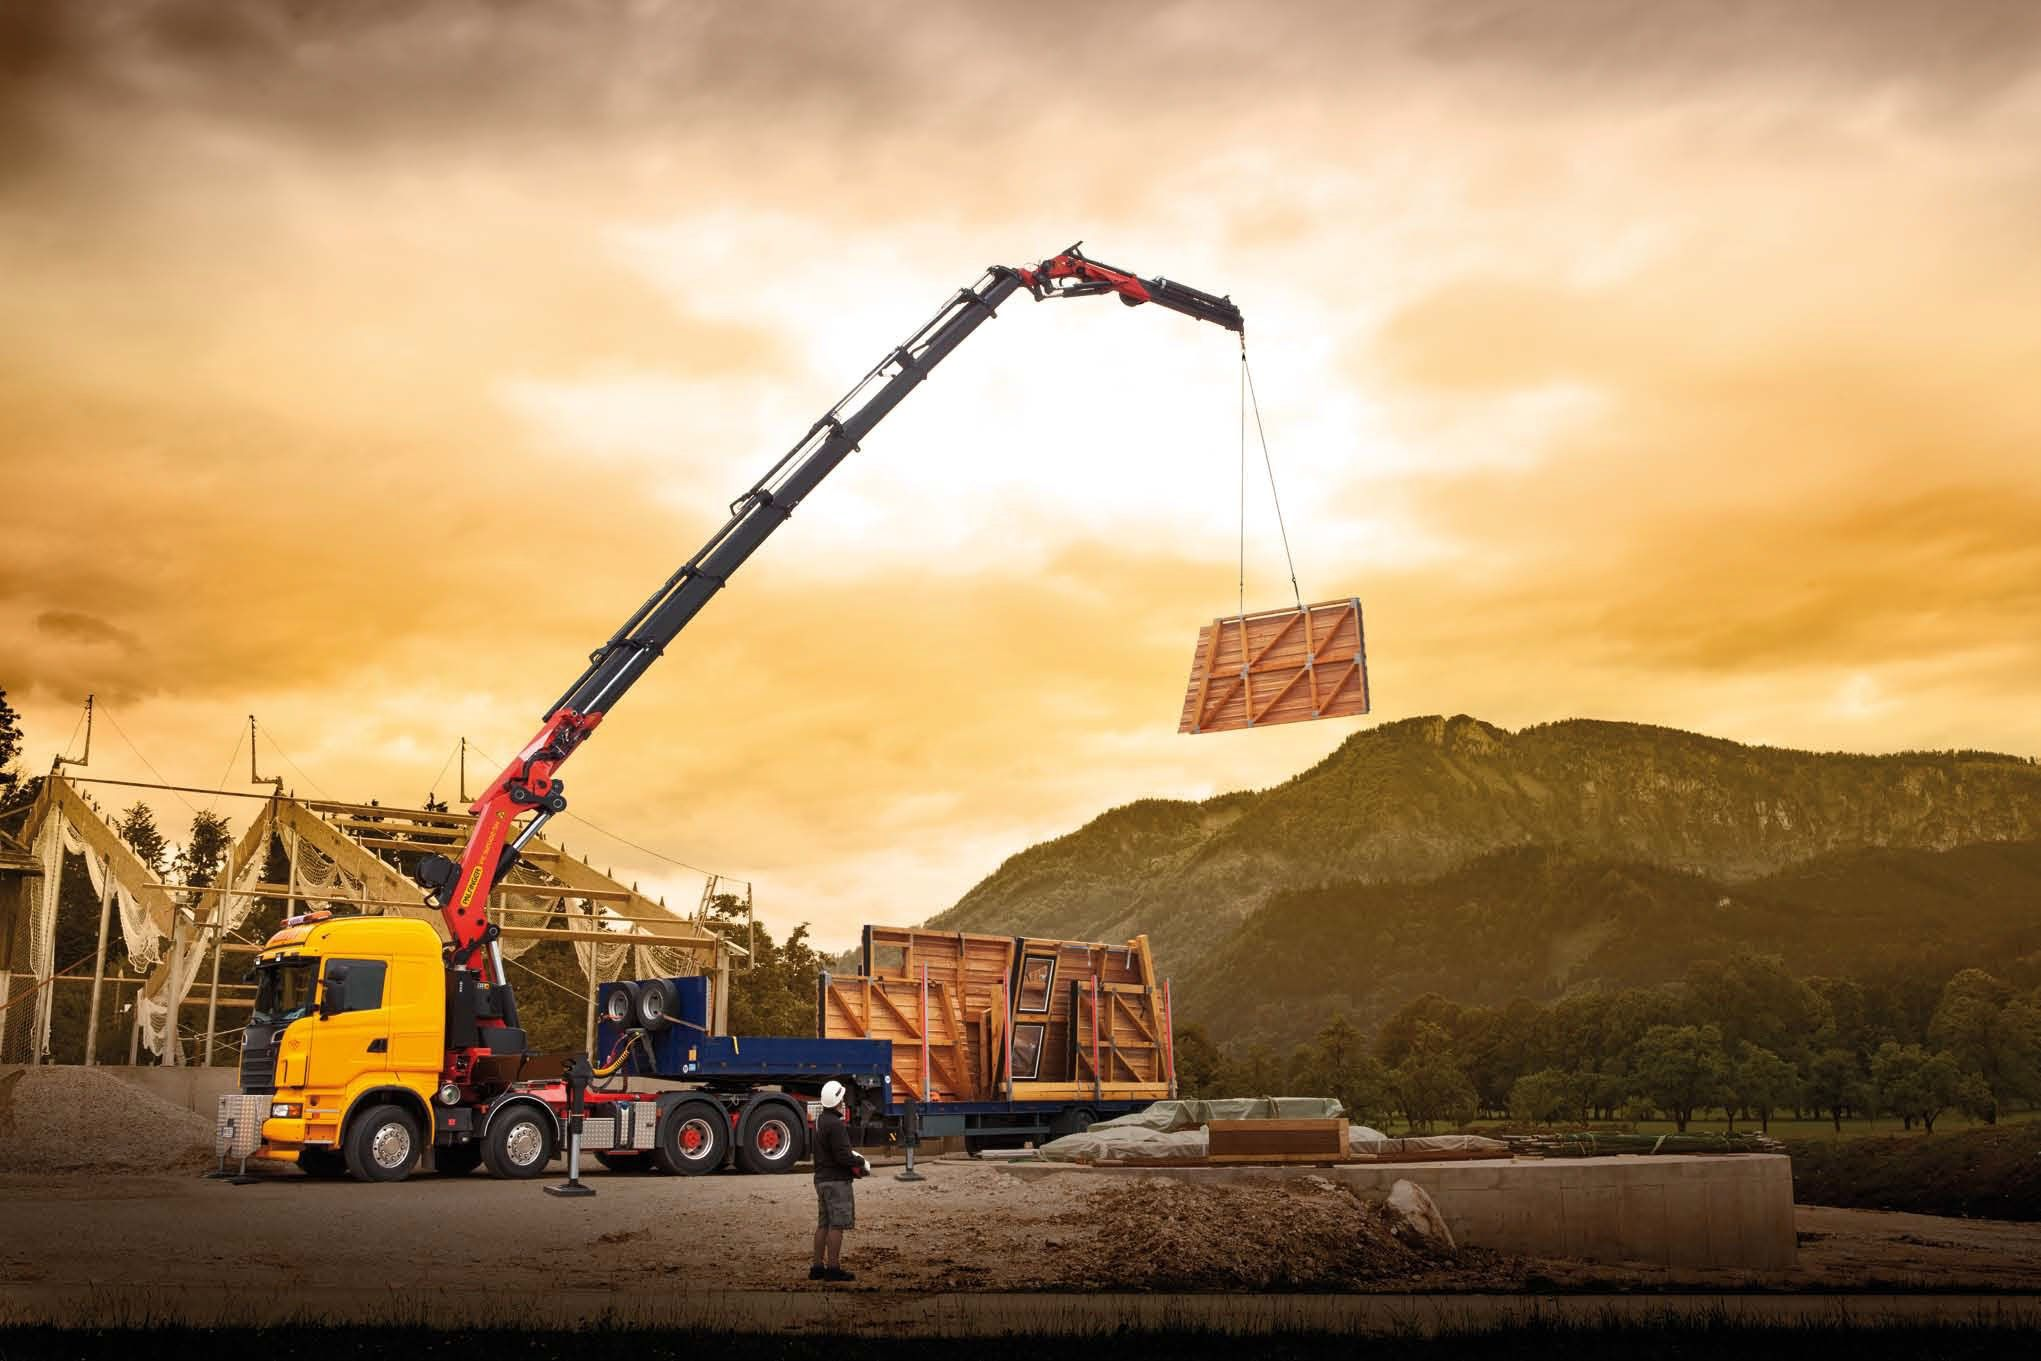 MOBILE CRANE construction truck semi tractor ariel cranes boom wallpaper background